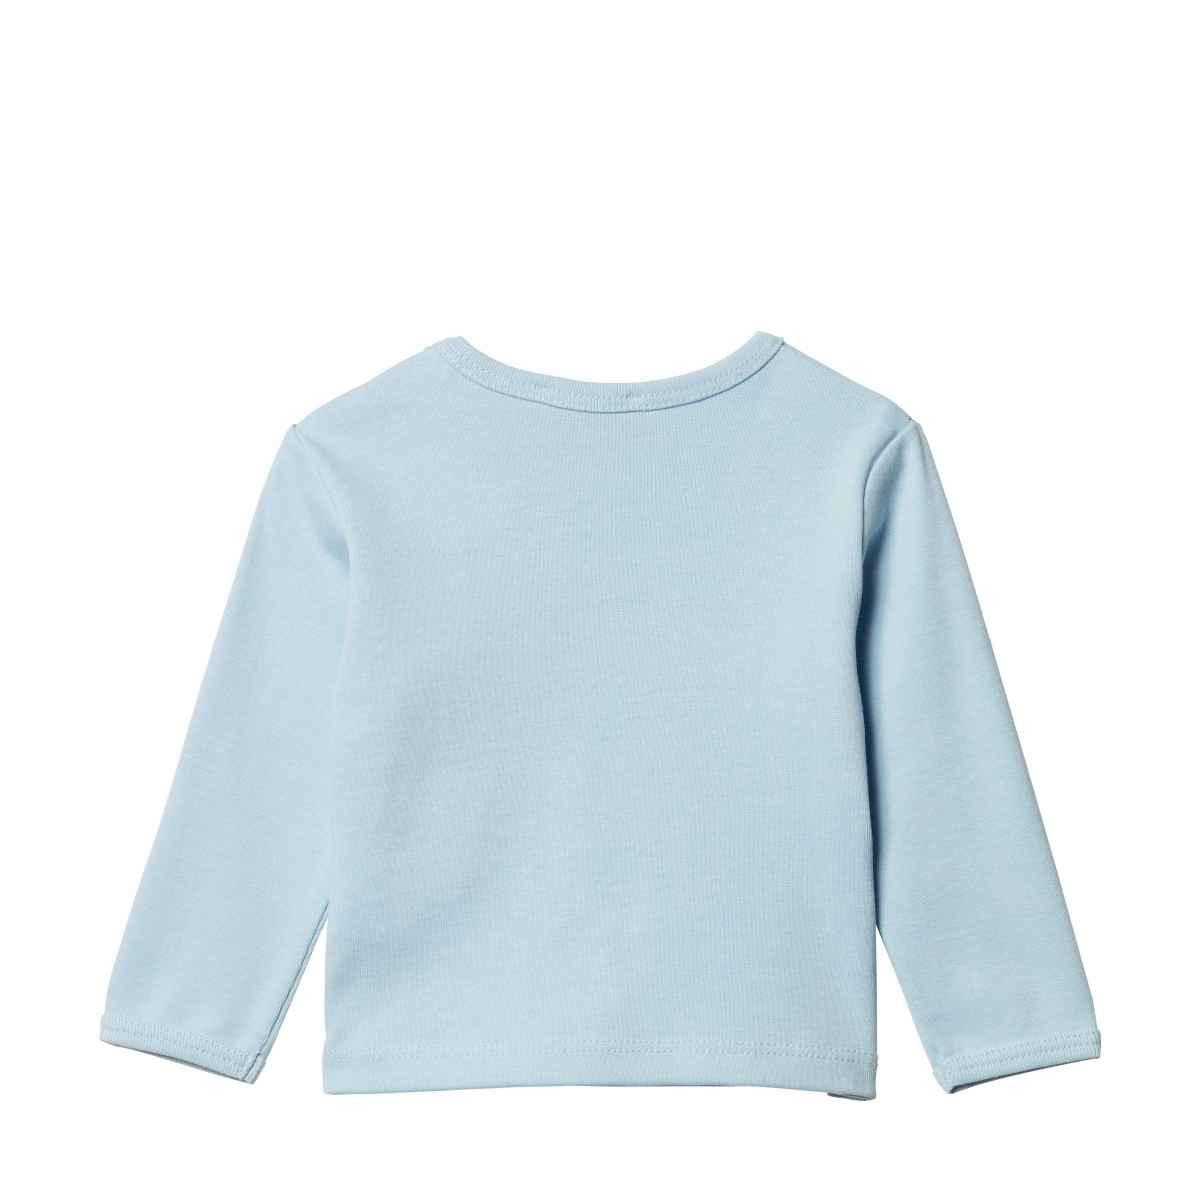 Steiff Steiff Blue T-Shirt with Teddy Motif